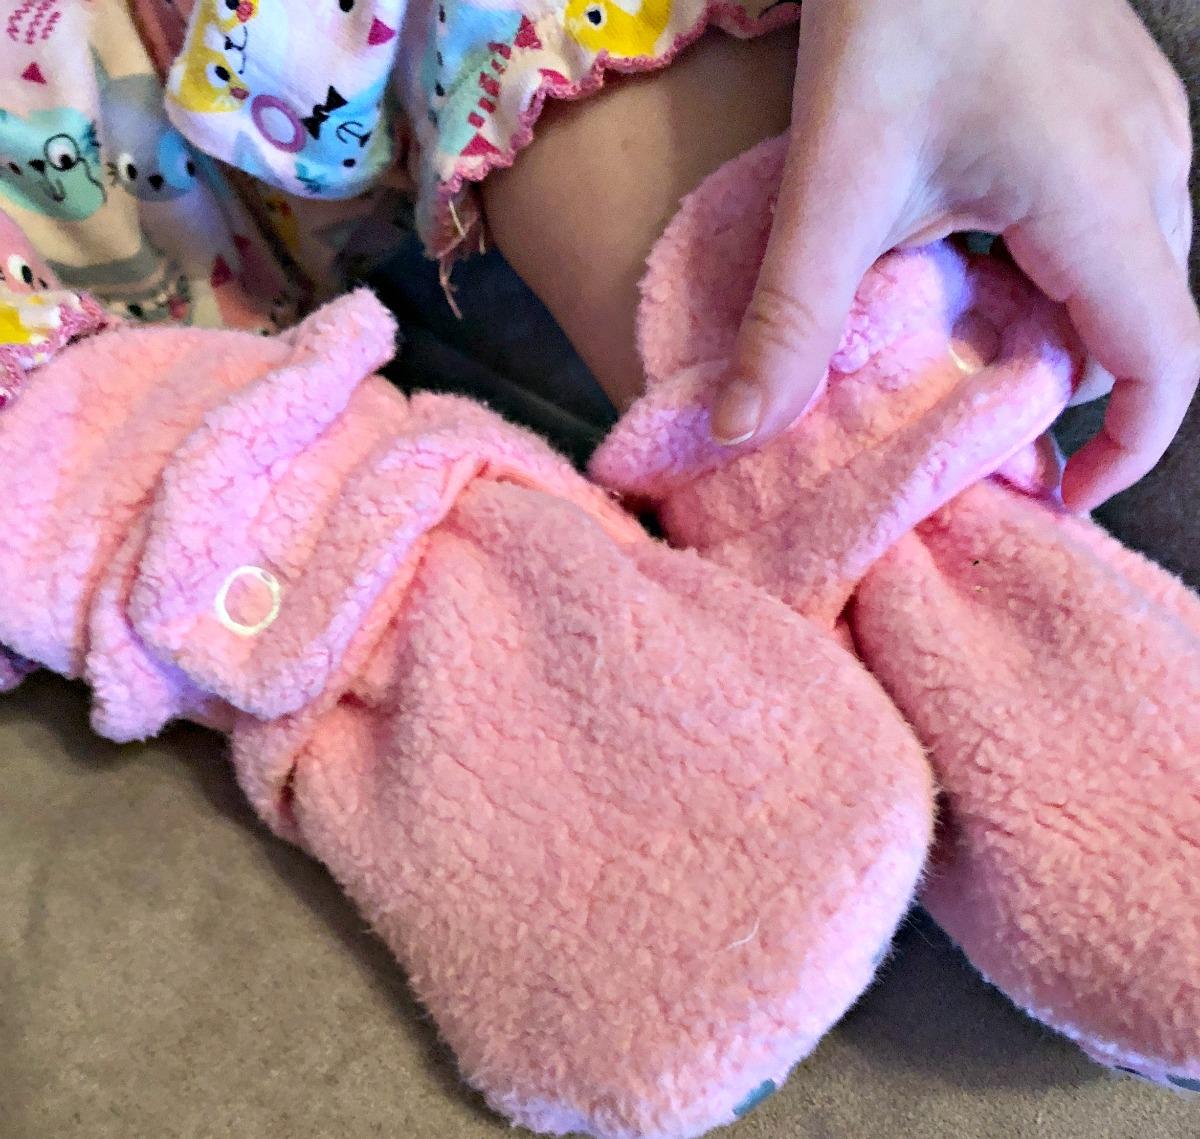 Zutano Cute, Cozy, Comfy, Children's Outfits PLUS More